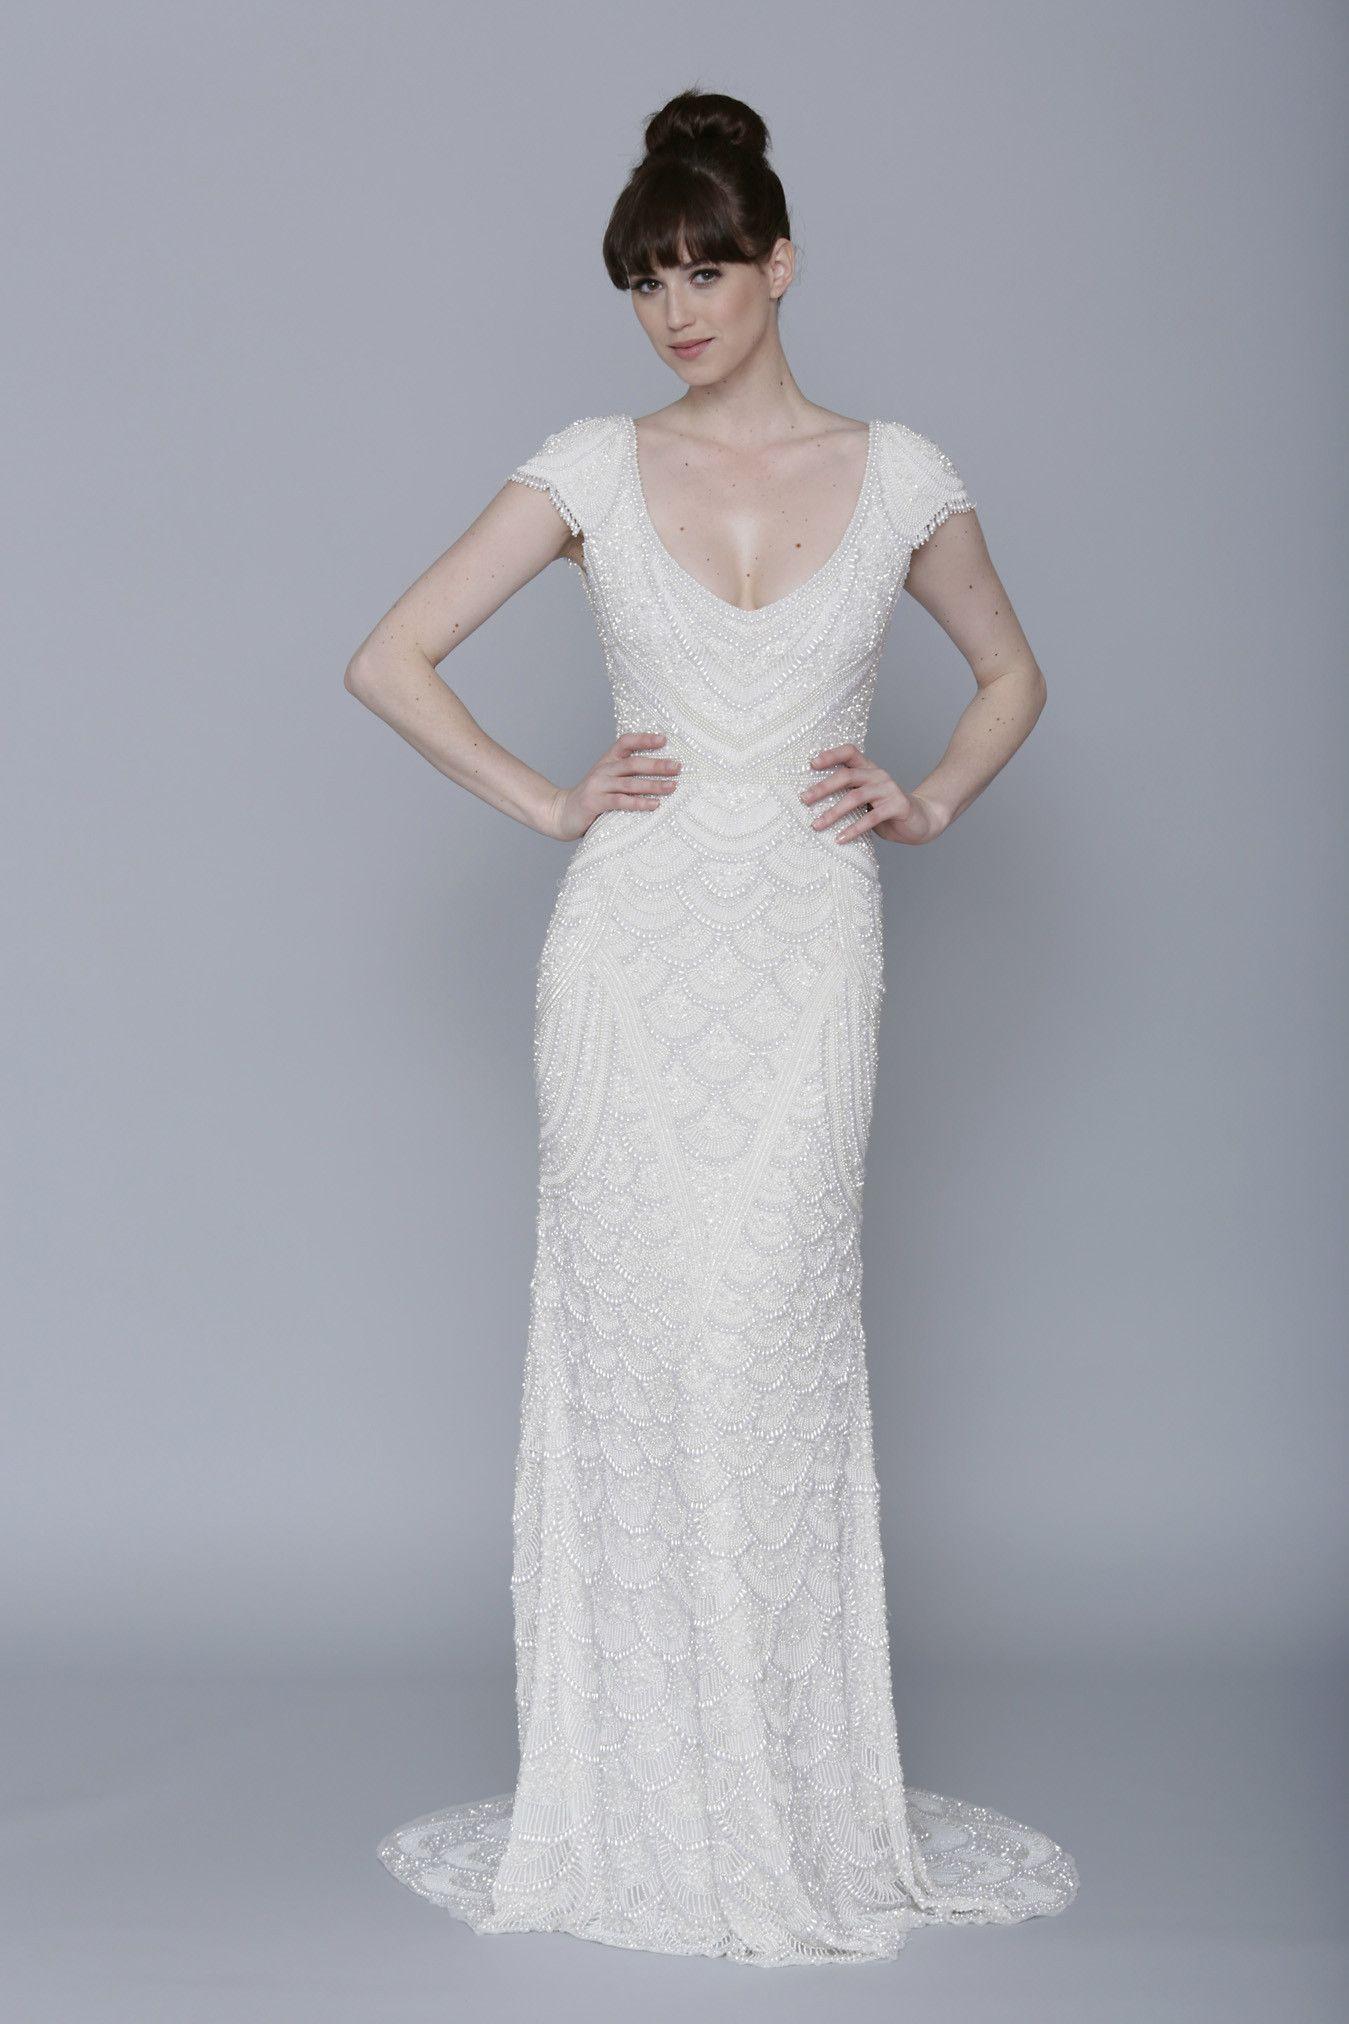 Dresses to wear at a wedding  Theia  Serena  French wedding Inspo  Pinterest  Wedding dress